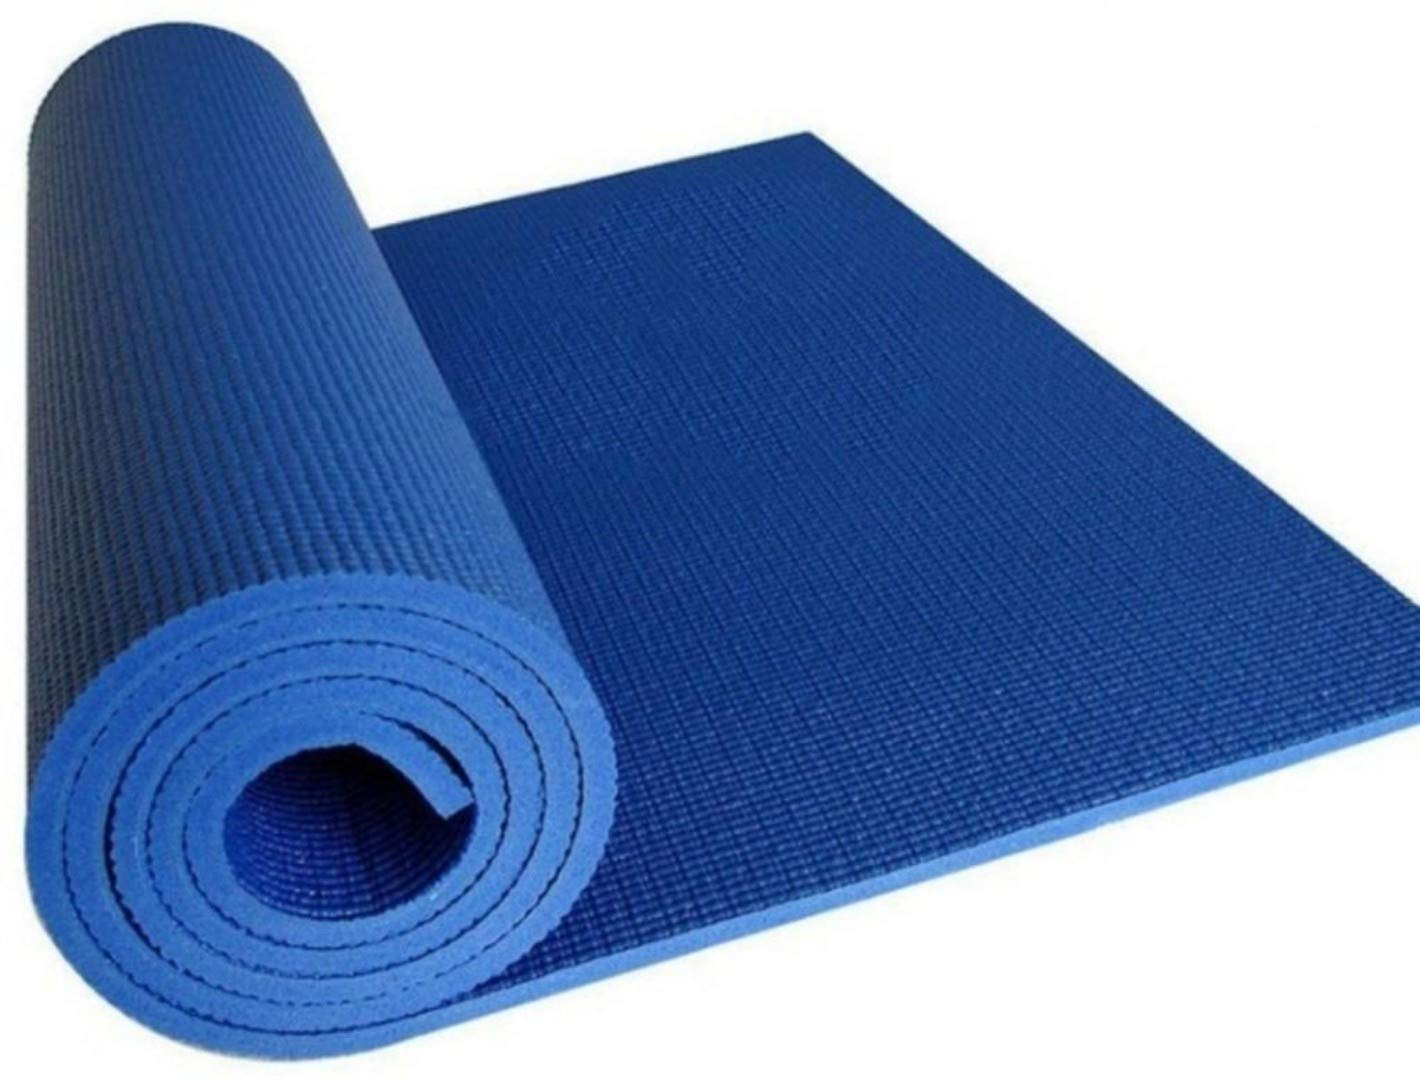 Rinki Home Furnishing Anti Skid yoga mat